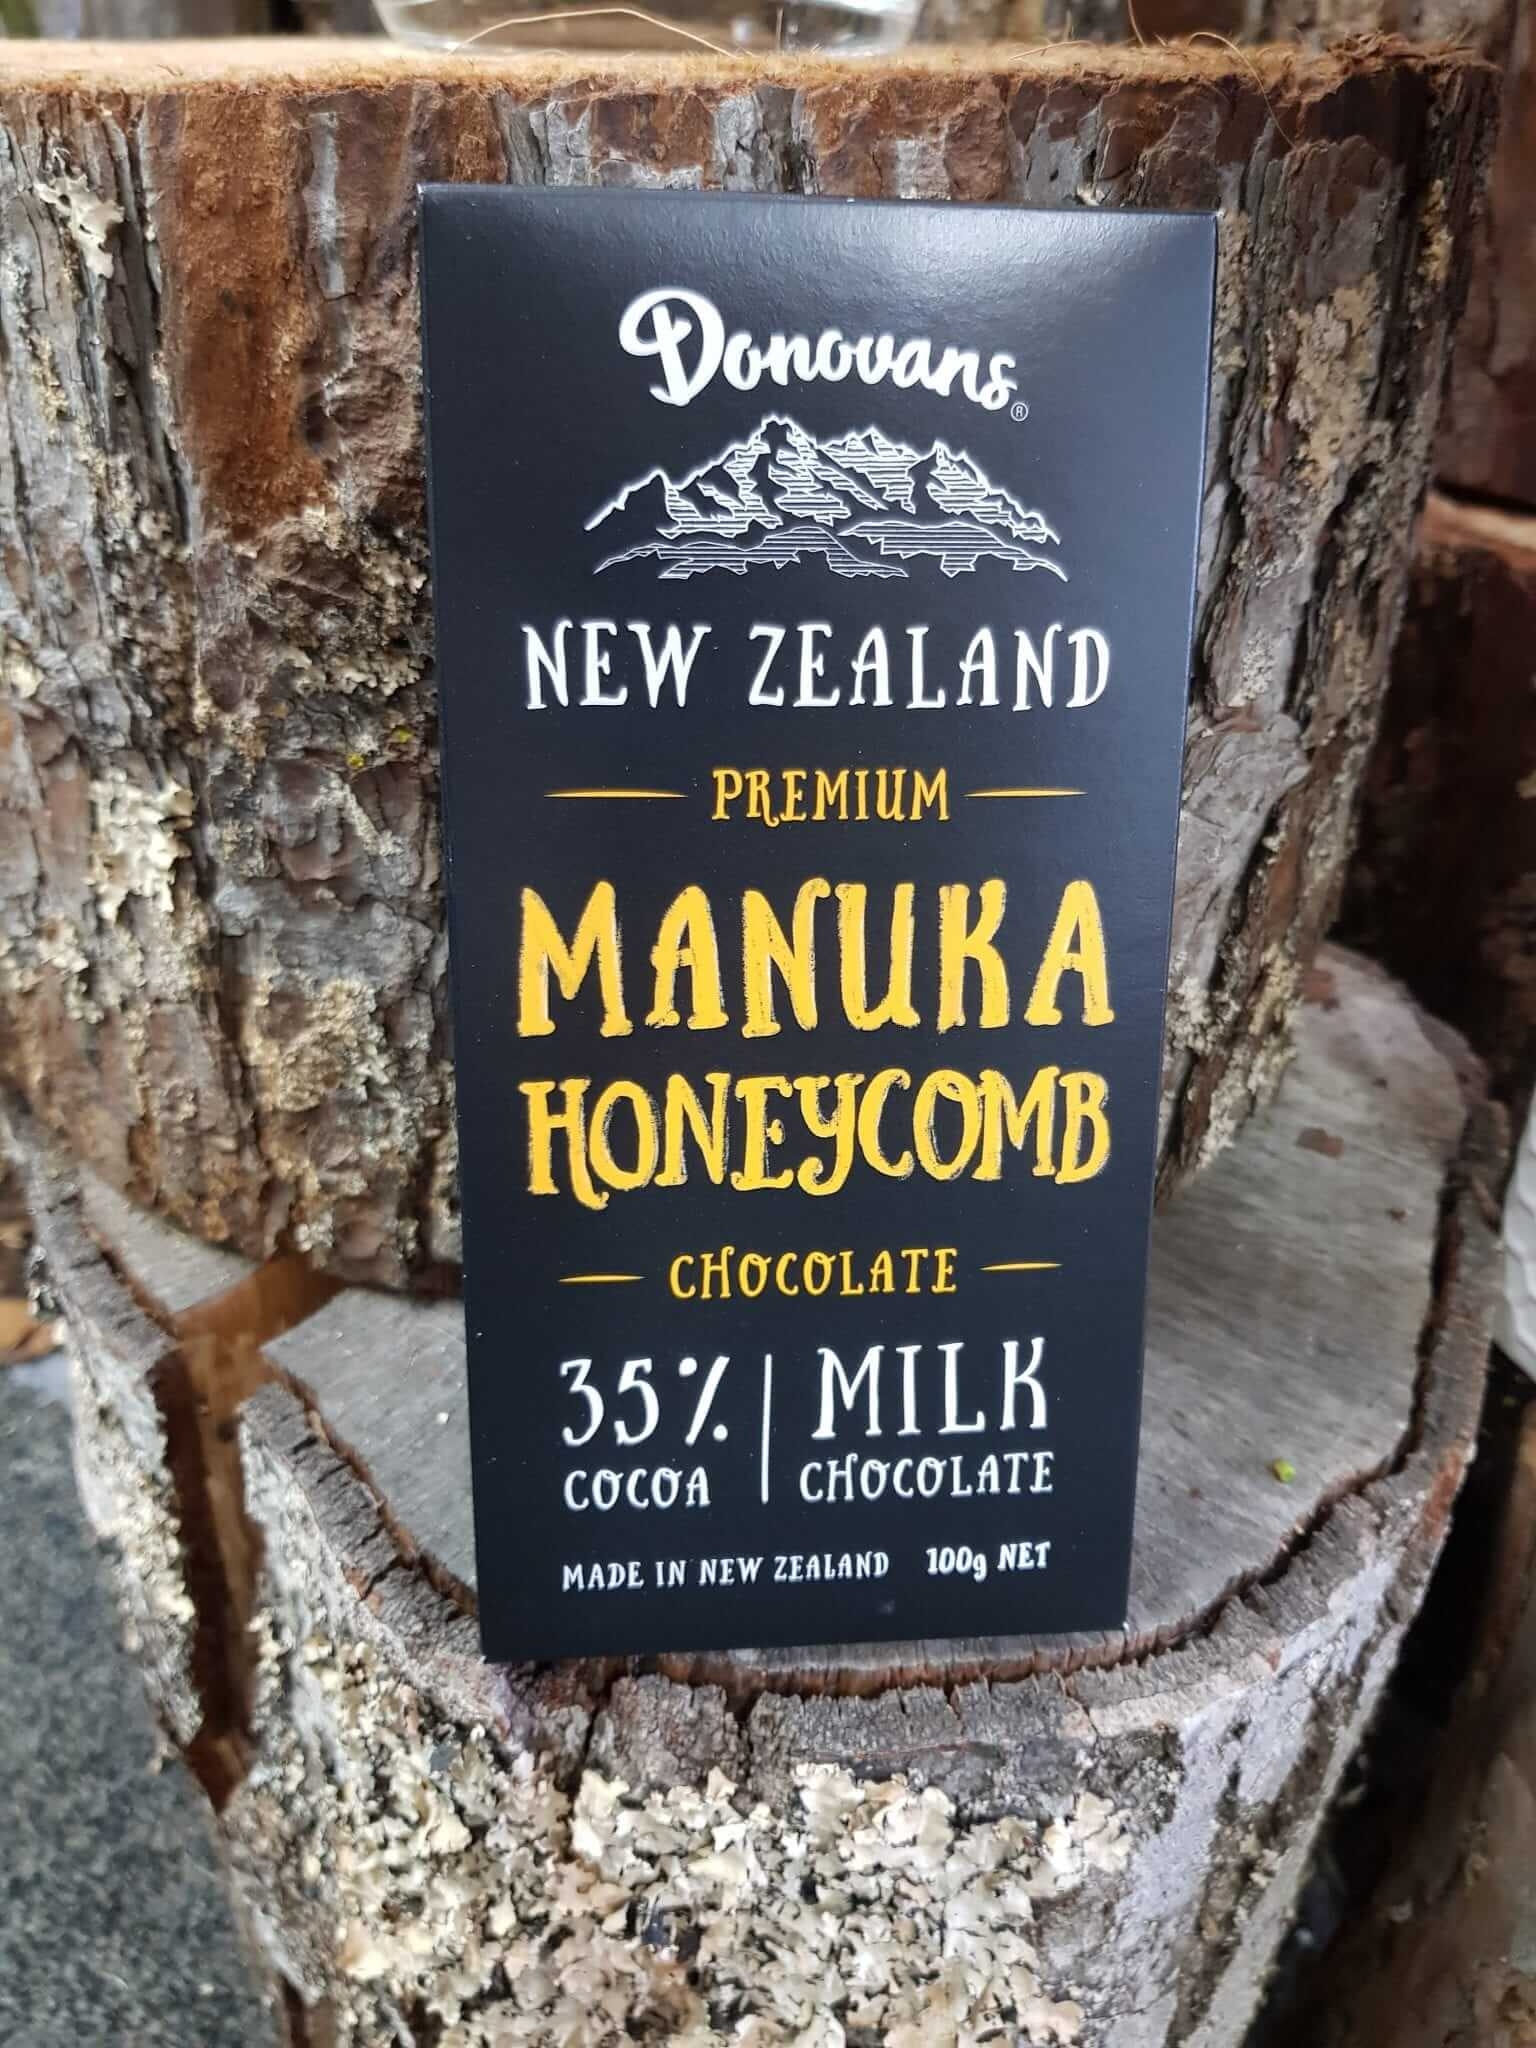 Manuka Honeycomb Donovans Chocolate